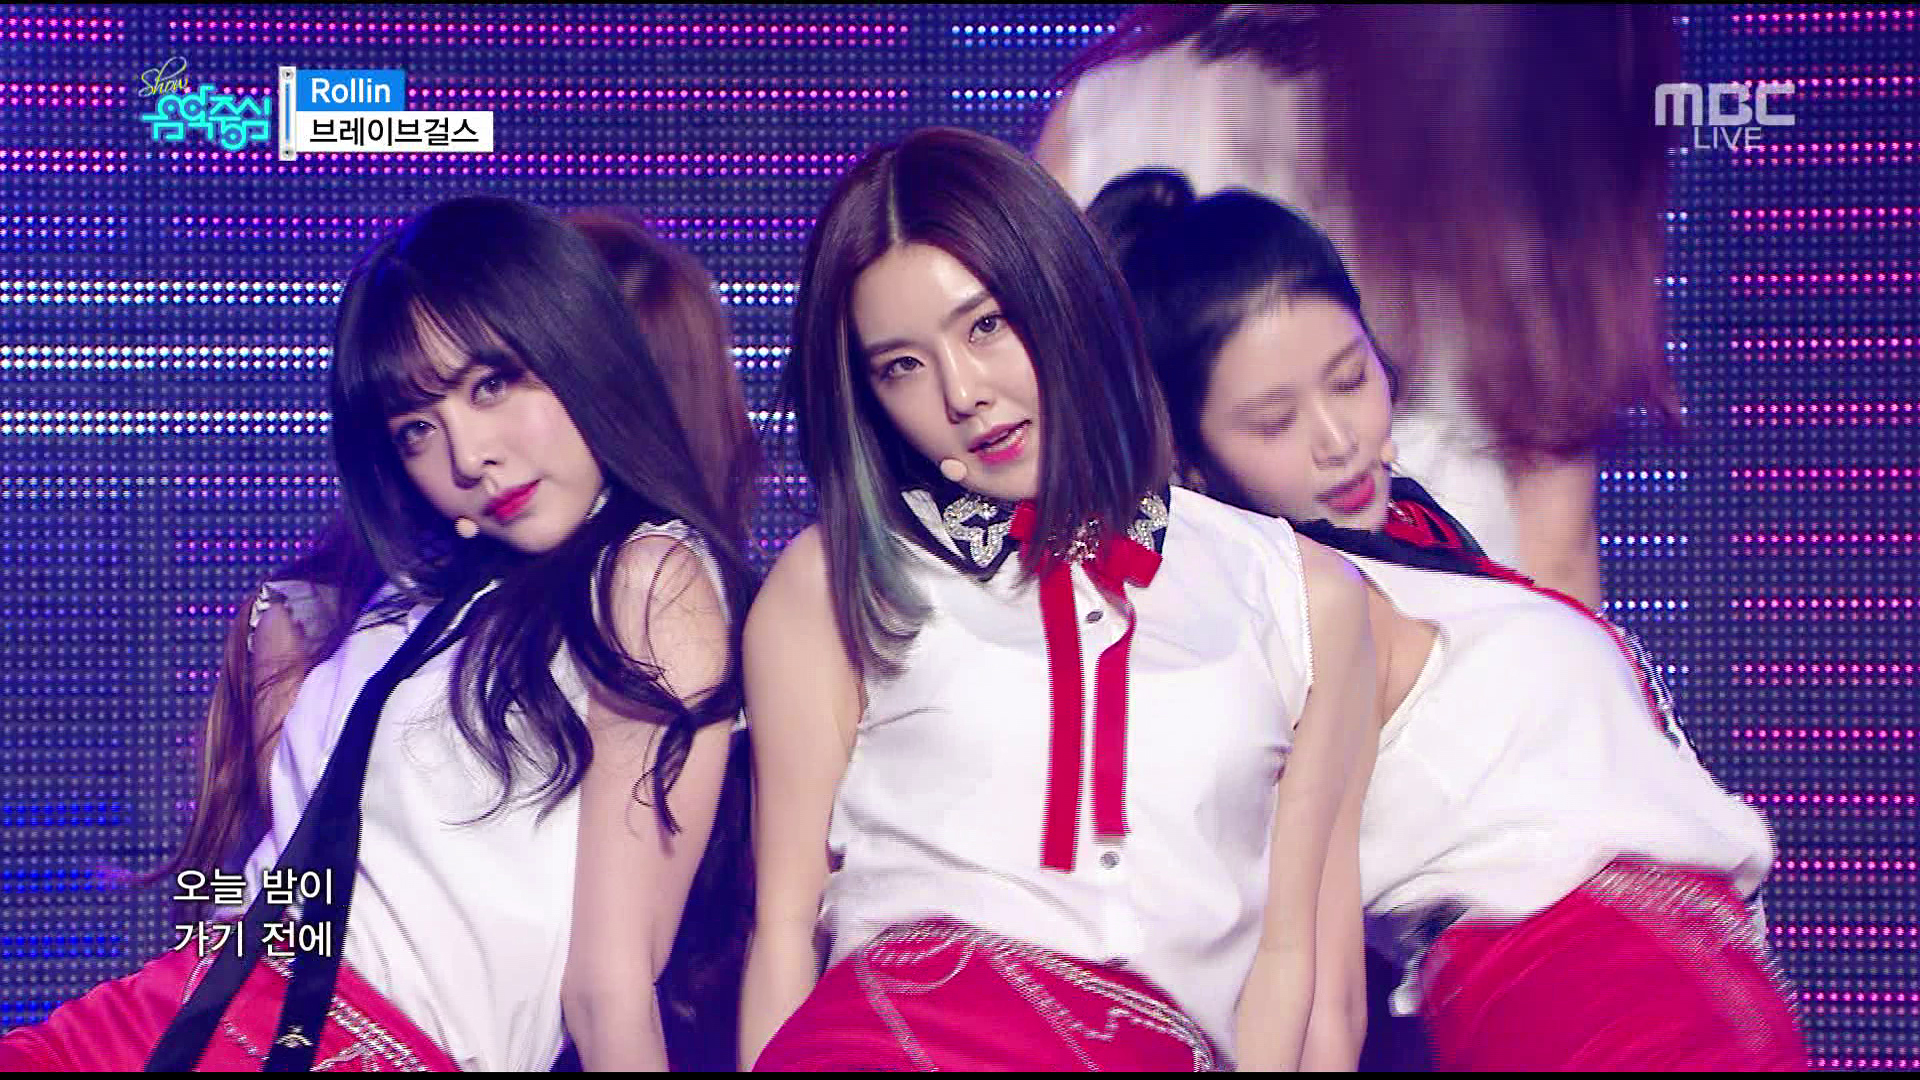 20170417.0726.1 Brave Girls - Rollin' (Music Core 2017.04.15) (JPOP.ru).ts.jpg